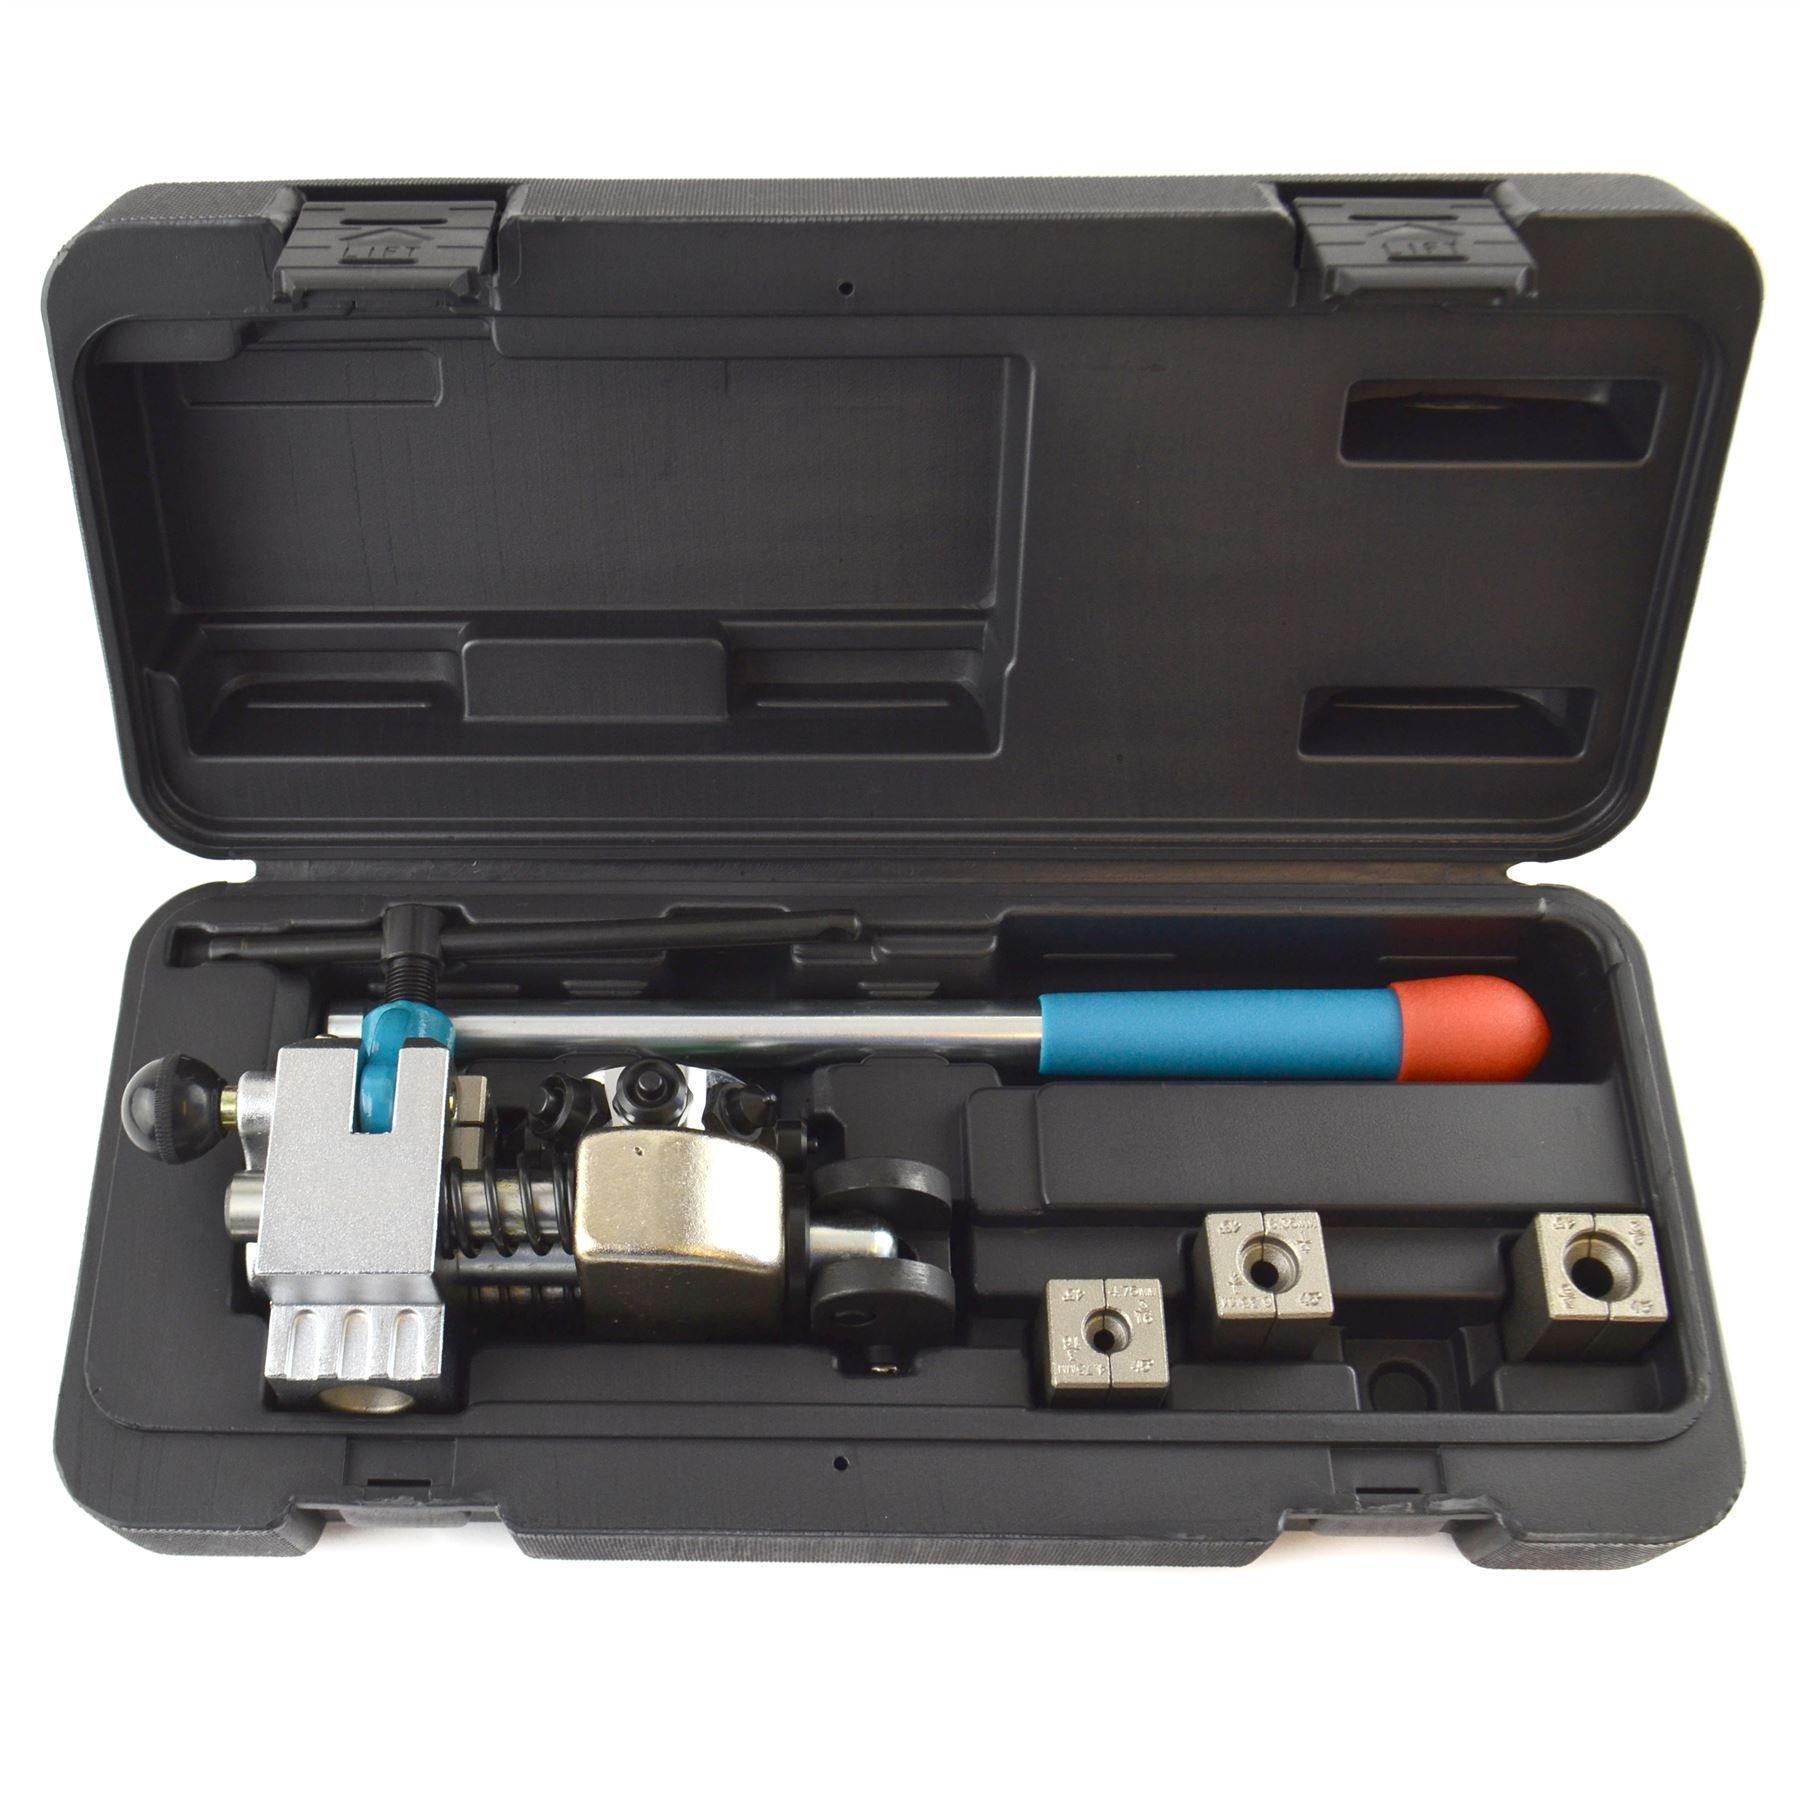 AB Tools-Toolzone Professional Turret Brake Tube Flare Brake Pipe Flaring 4 x Dies Fuel Lines TE913